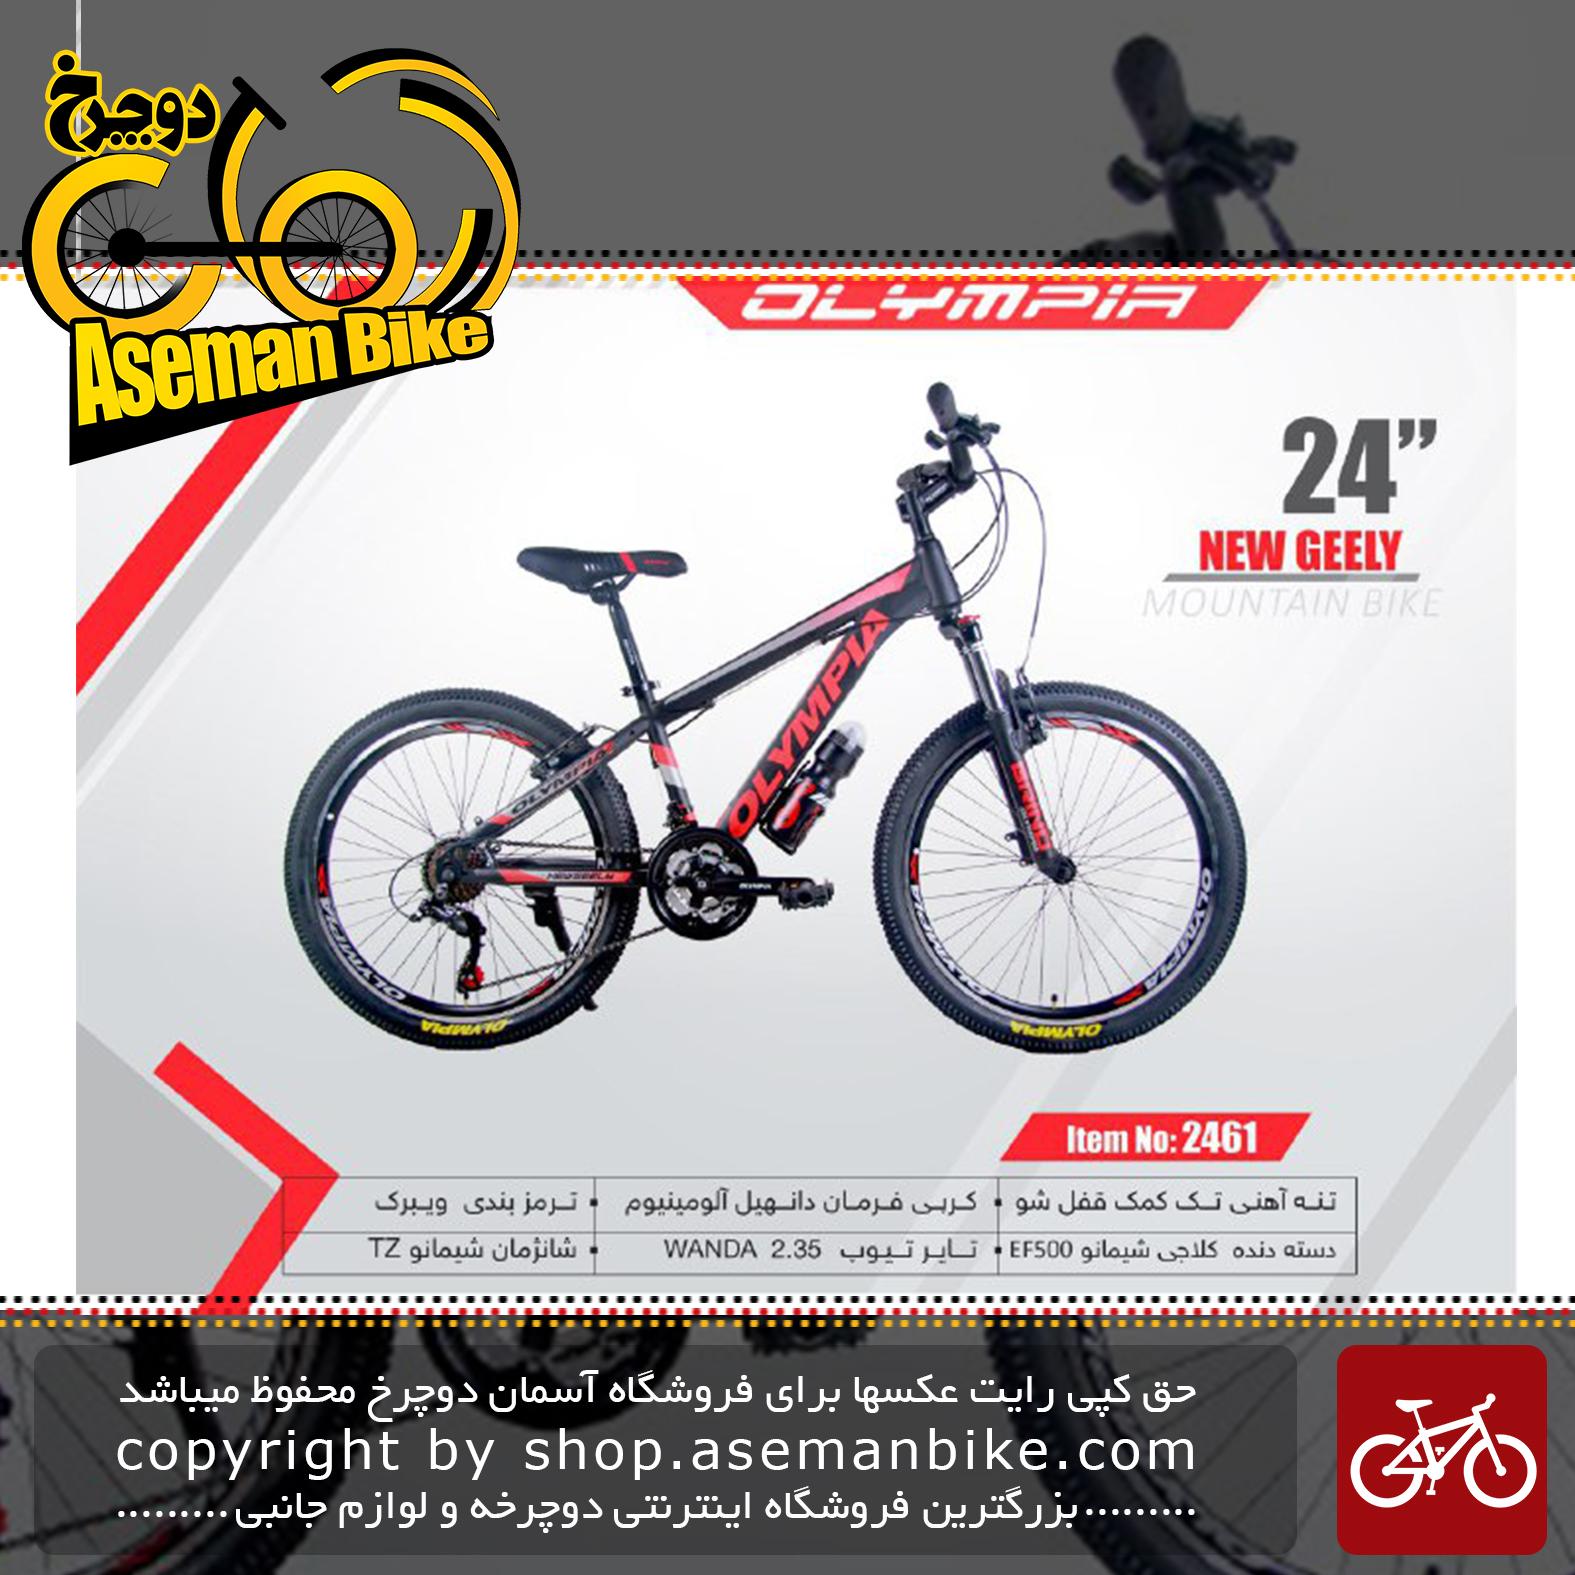 دوچرخه کوهستان المپیا سایز 24مدل نیو جیلی OLYMPIA SIZE 24 NEW GILLY